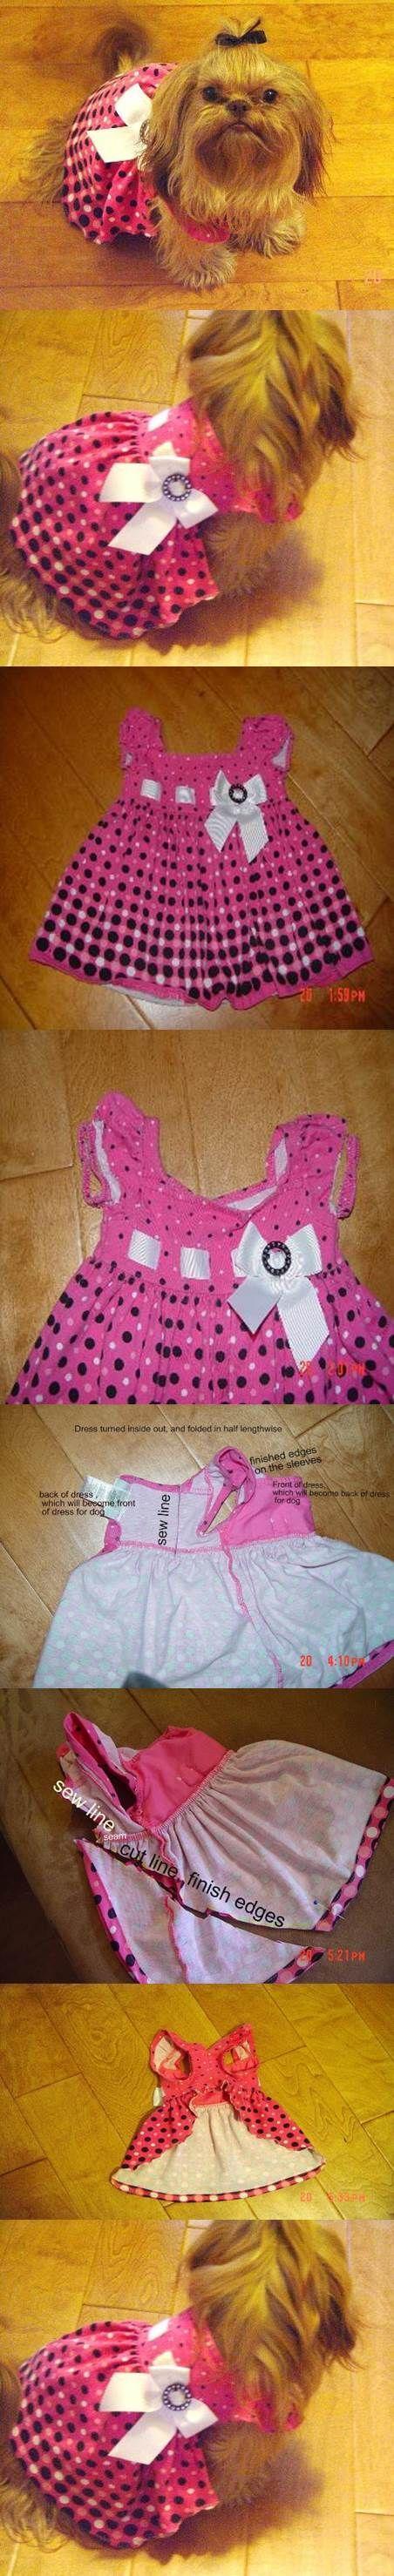 DIY Dog Dress from Baby Dress 2